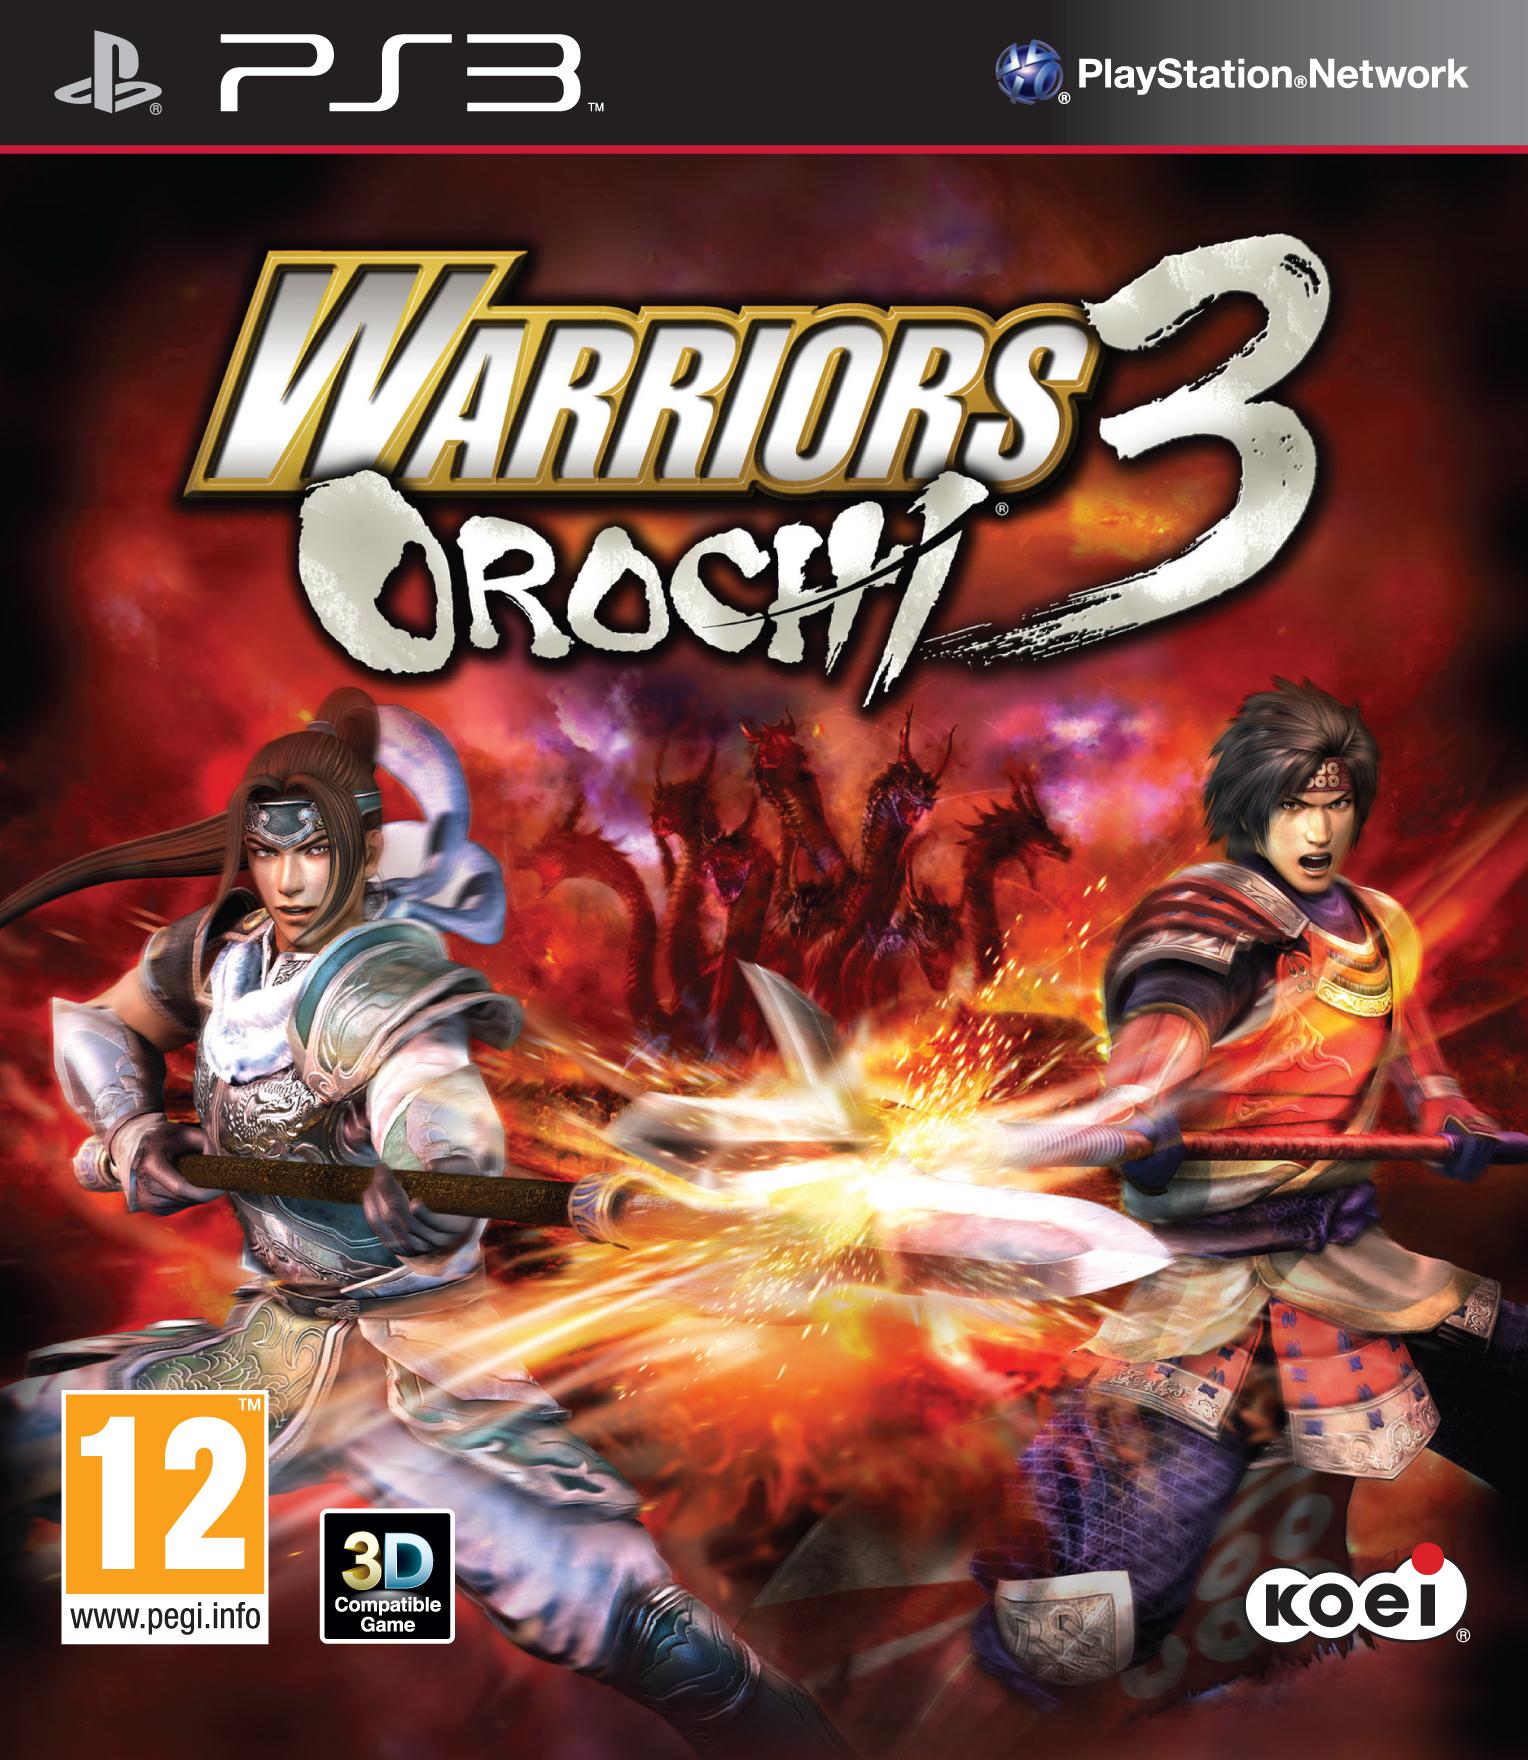 Warrior orochi 2 mod porn pics sexual tits